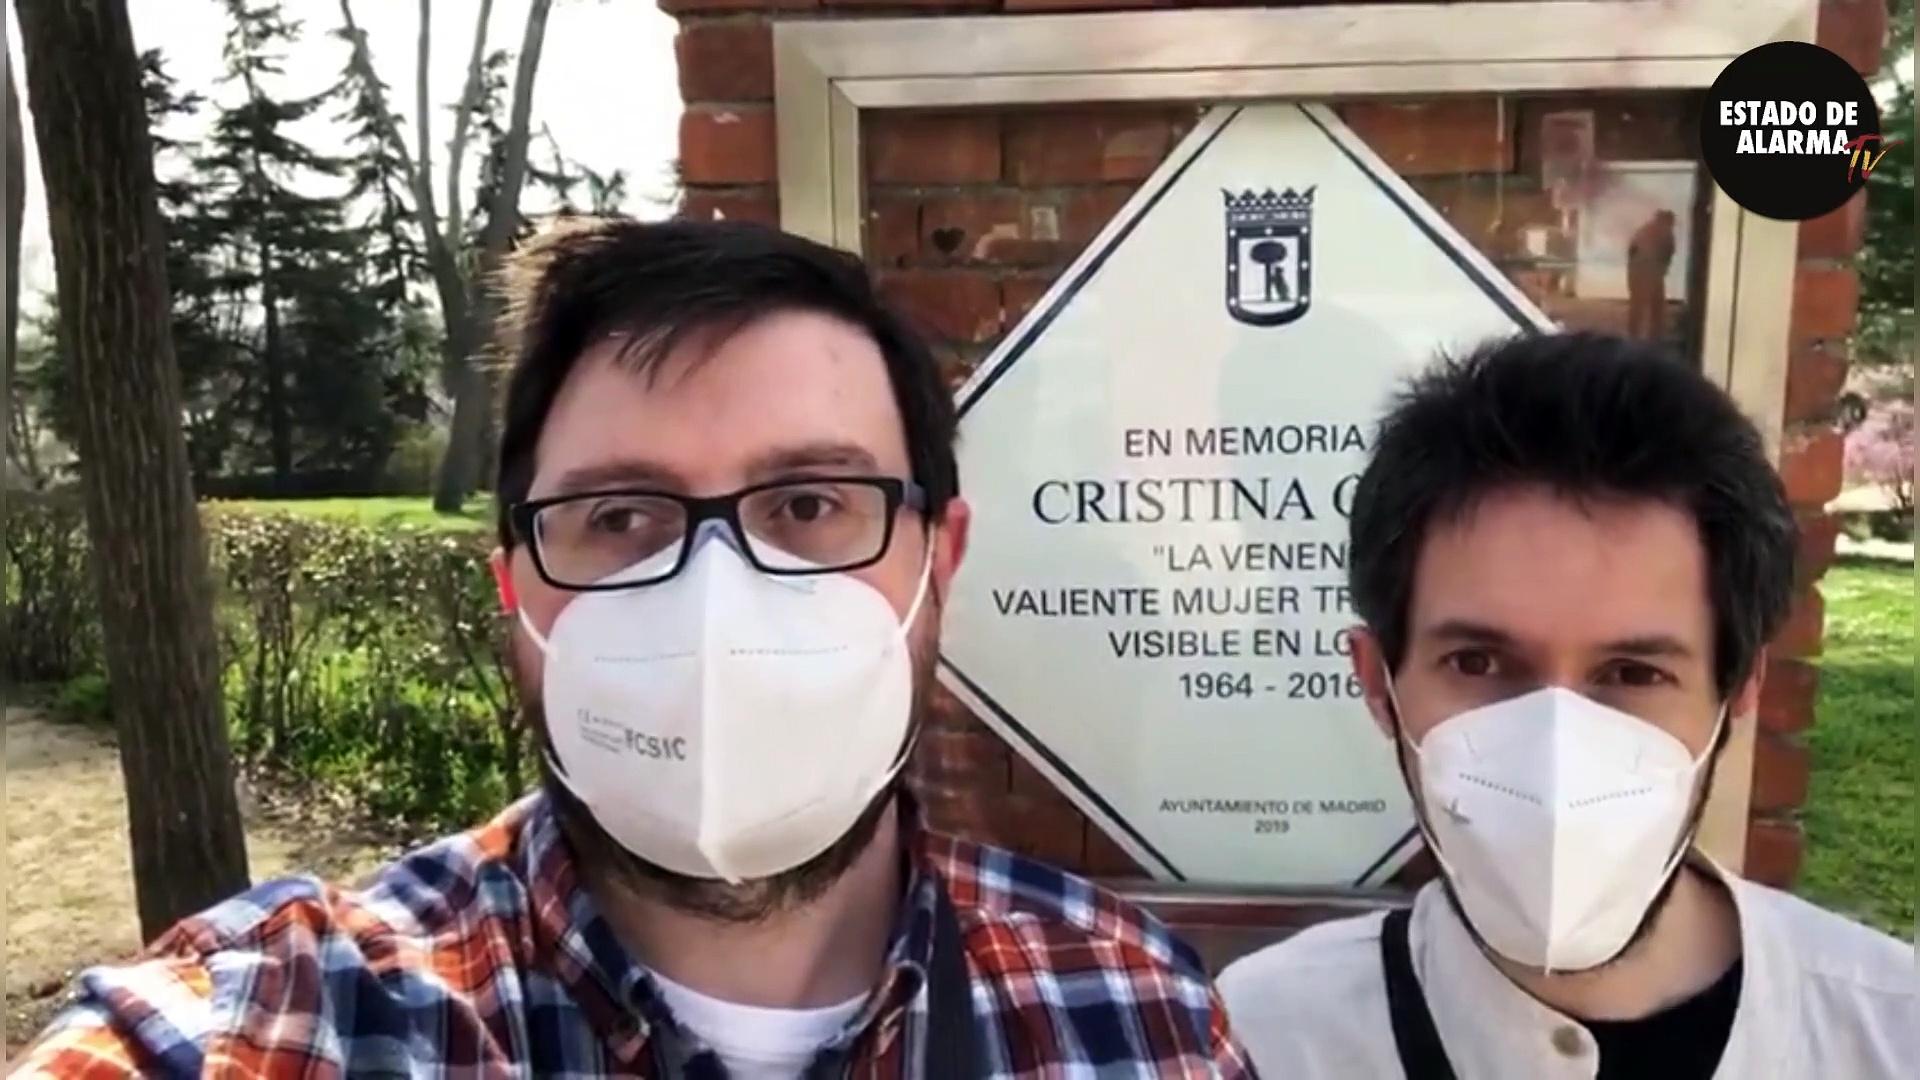 Vandalizan la placa de 'La Veneno' en Madrid